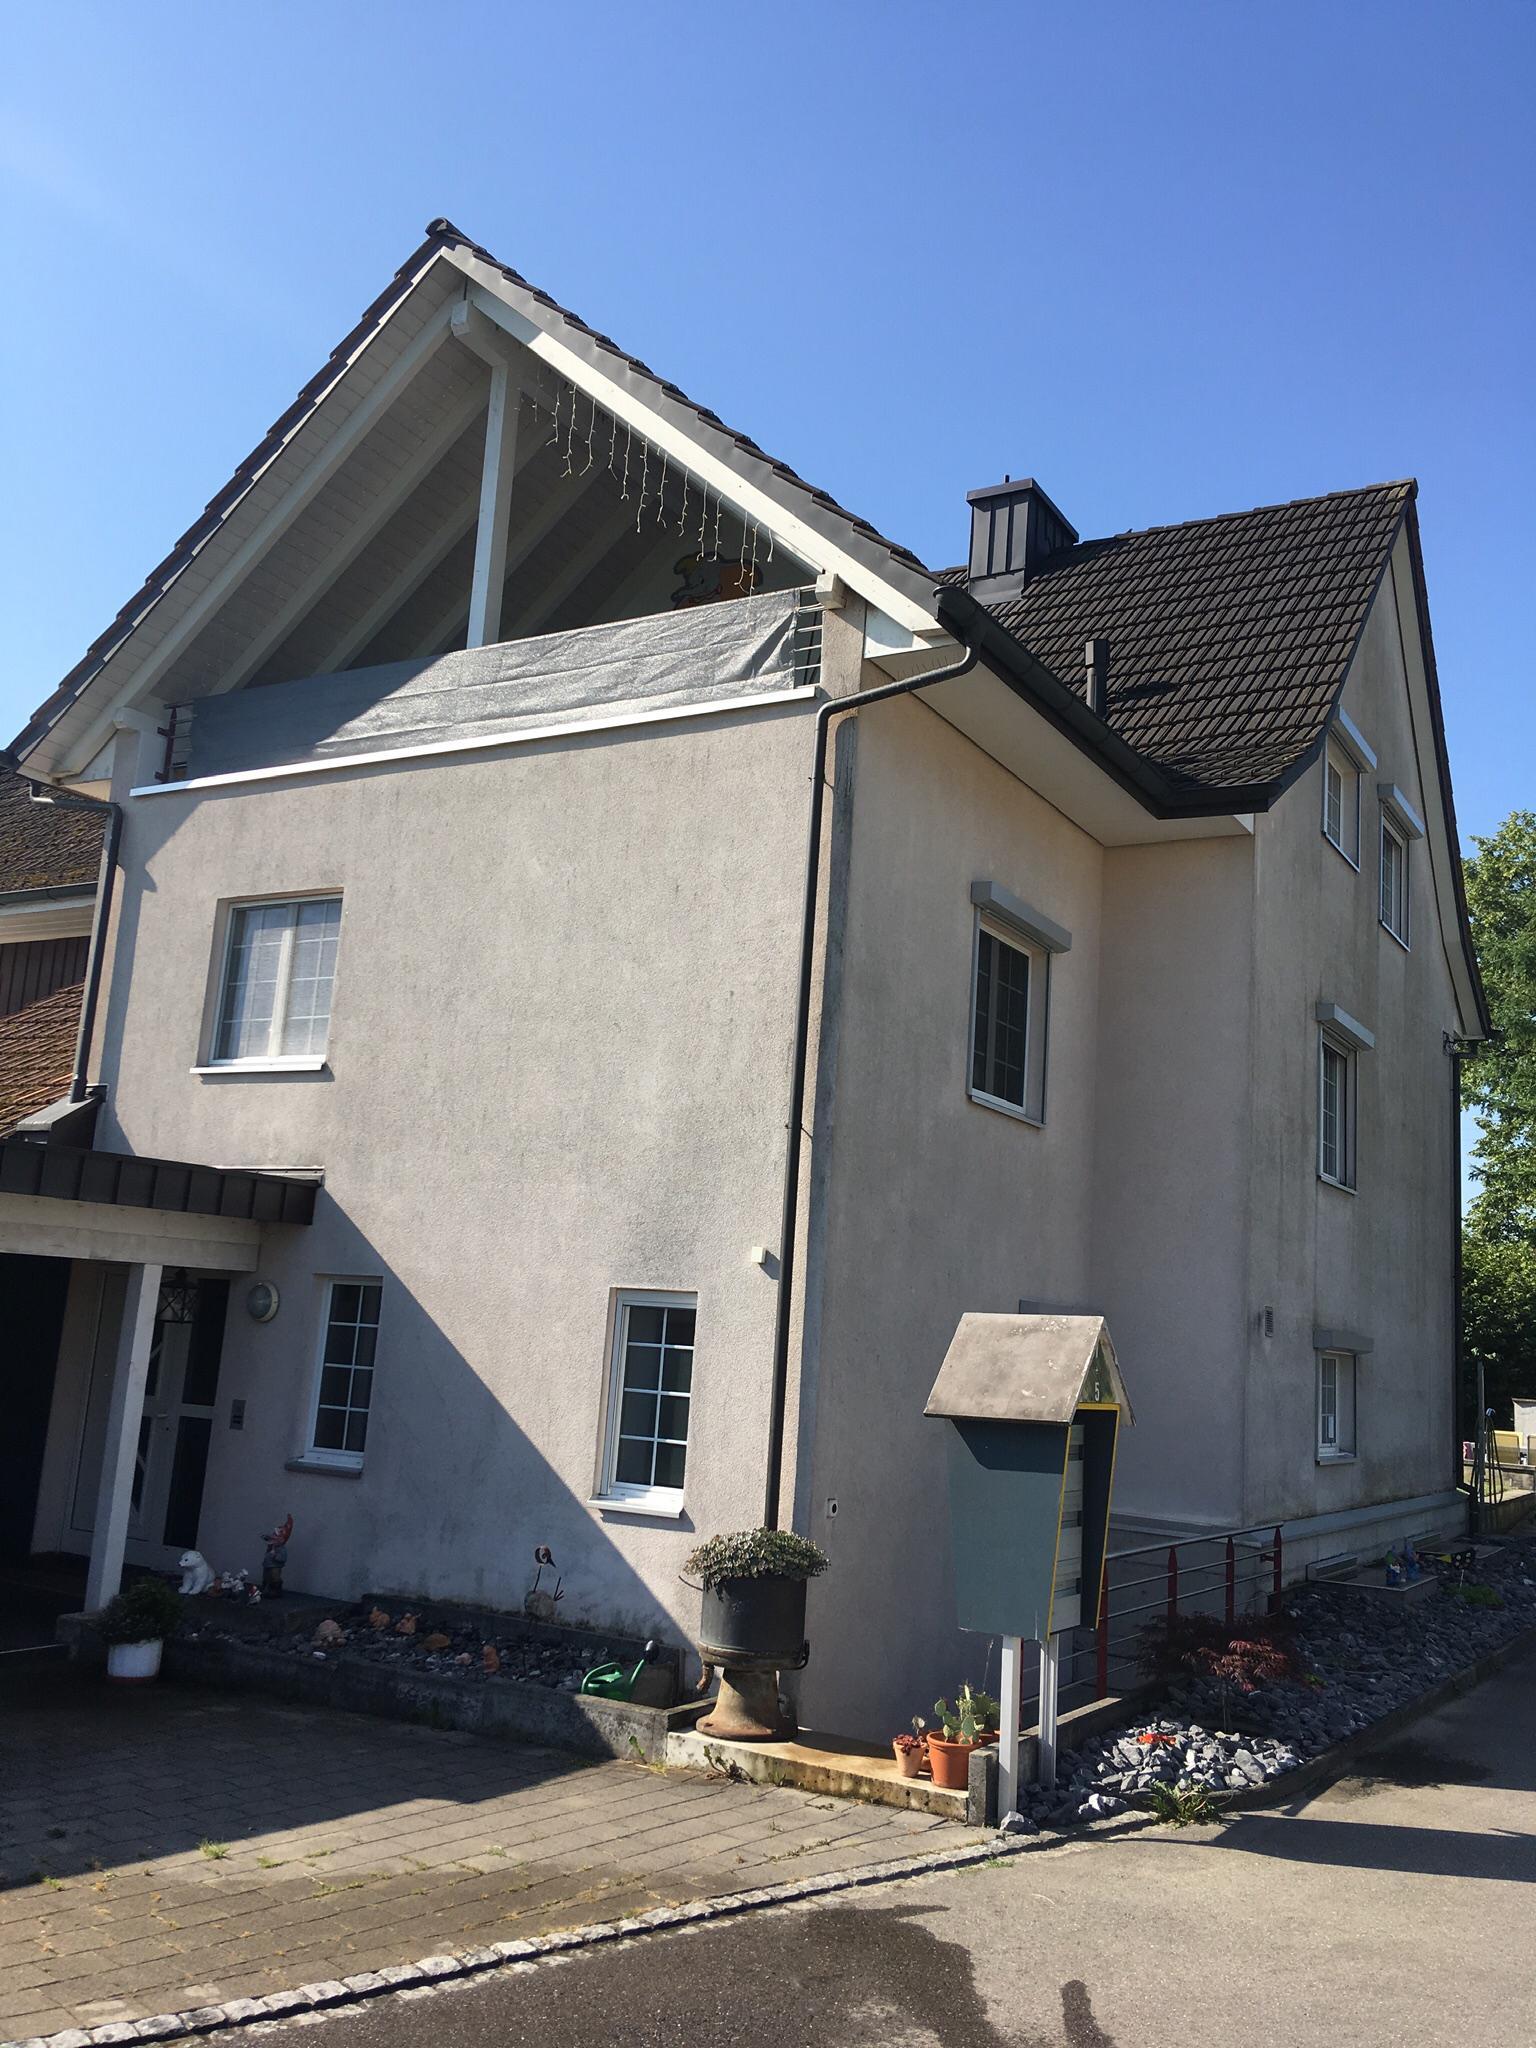 https://www.koster-gs.ch/wp-content/uploads/2021/07/Hengartner-Fassade-2-Nord-vorher.jpg